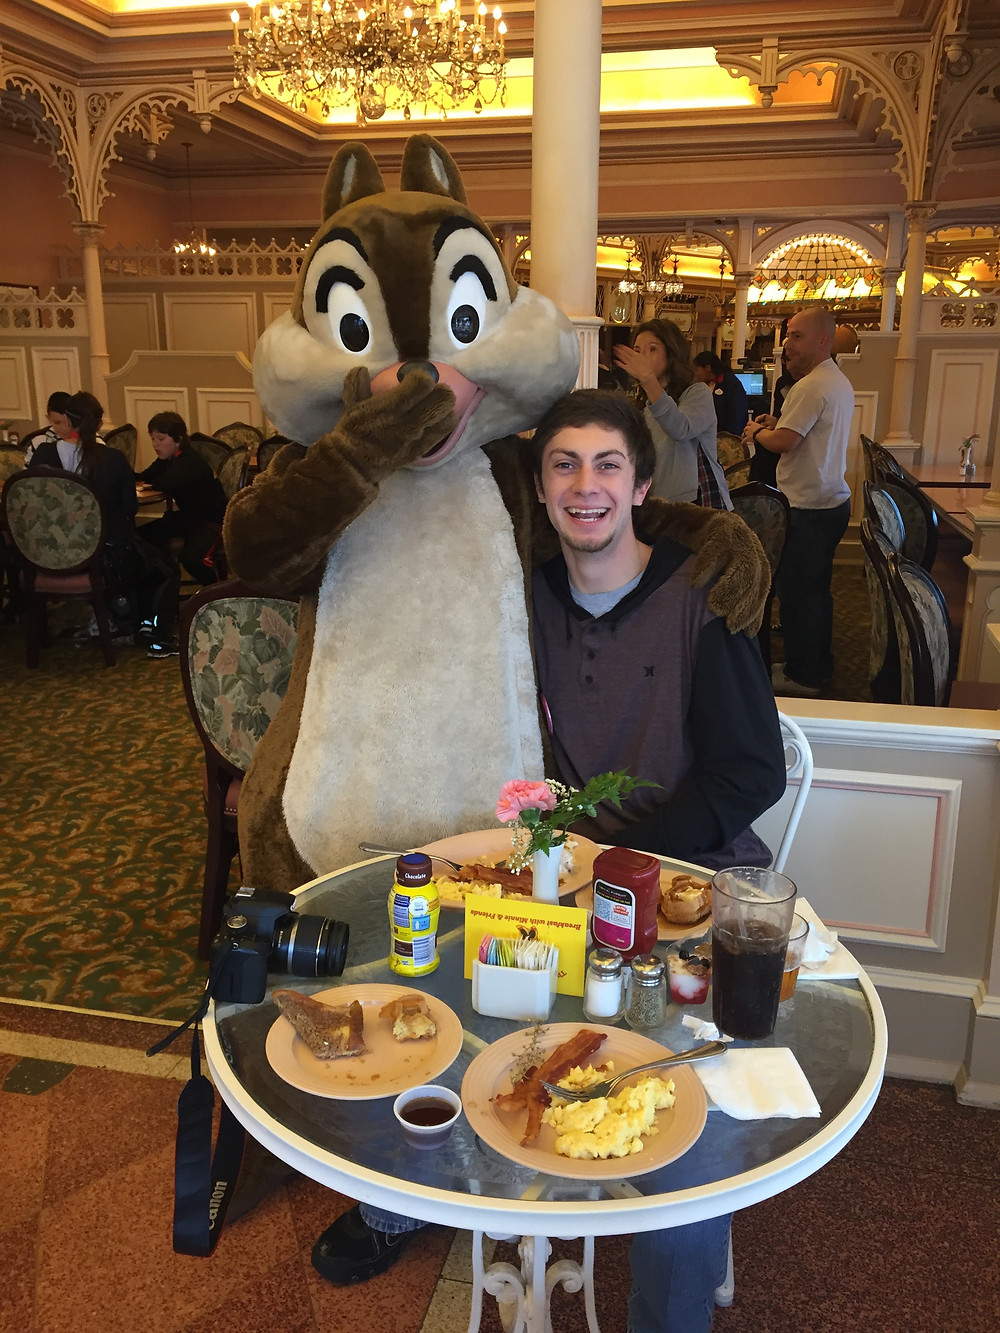 EscapeReno - Plaza Inn at Disneyland